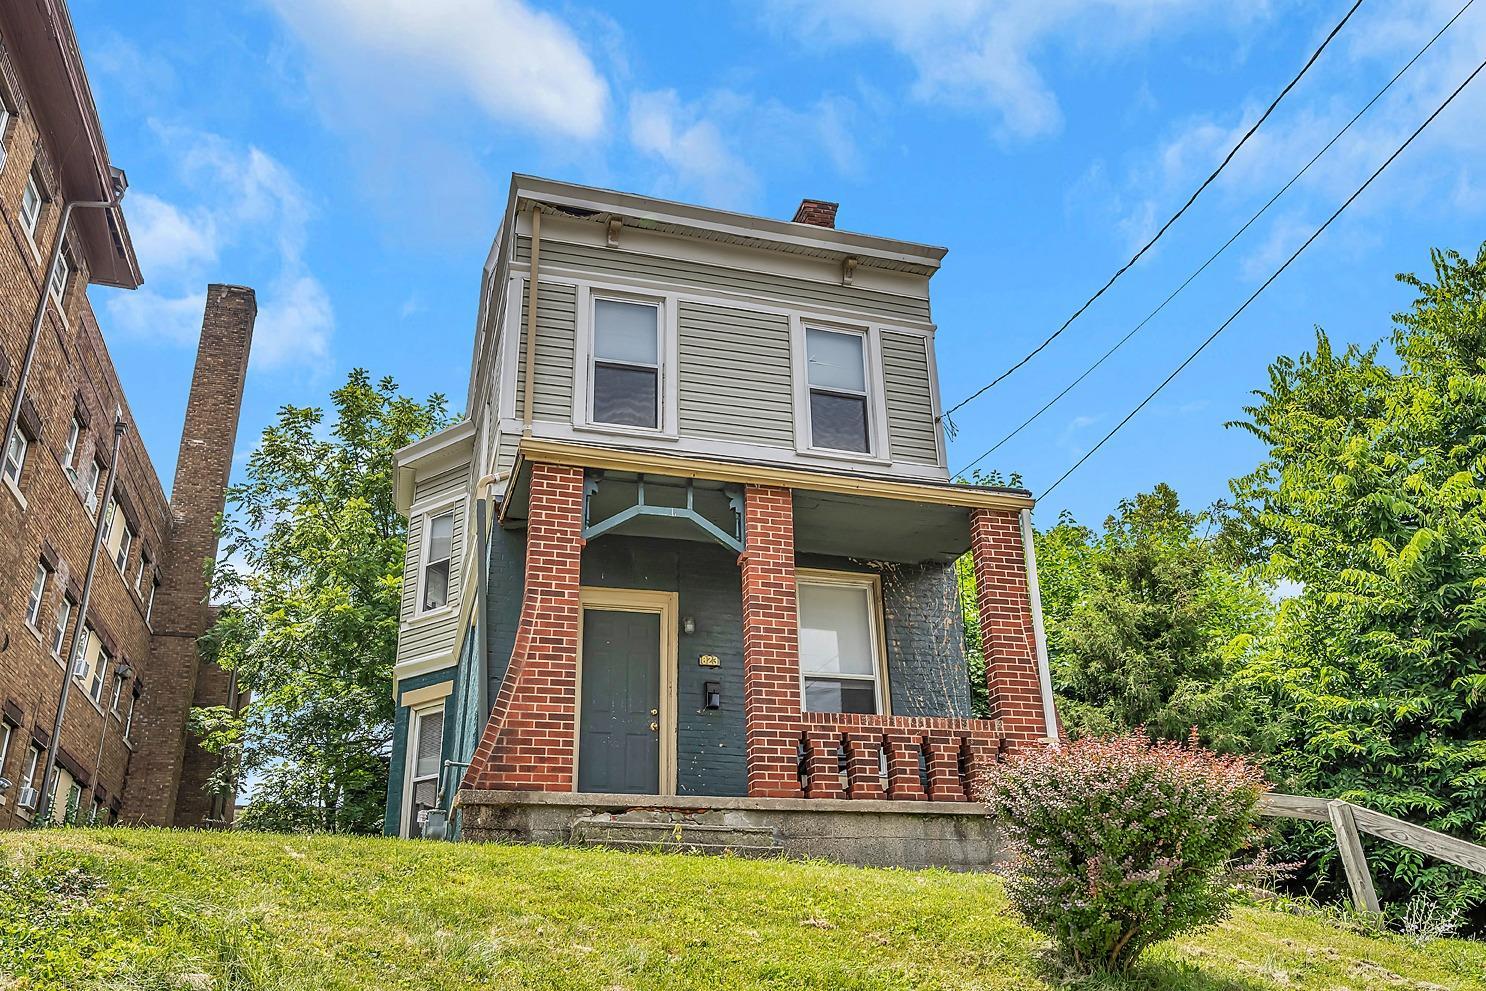 823 Wm H Taft Road, Cincinnati, Ohio 45206, 4 Bedrooms Bedrooms, ,2 BathroomsBathrooms,Single Family Residence,For Sale,Wm H Taft,1716187